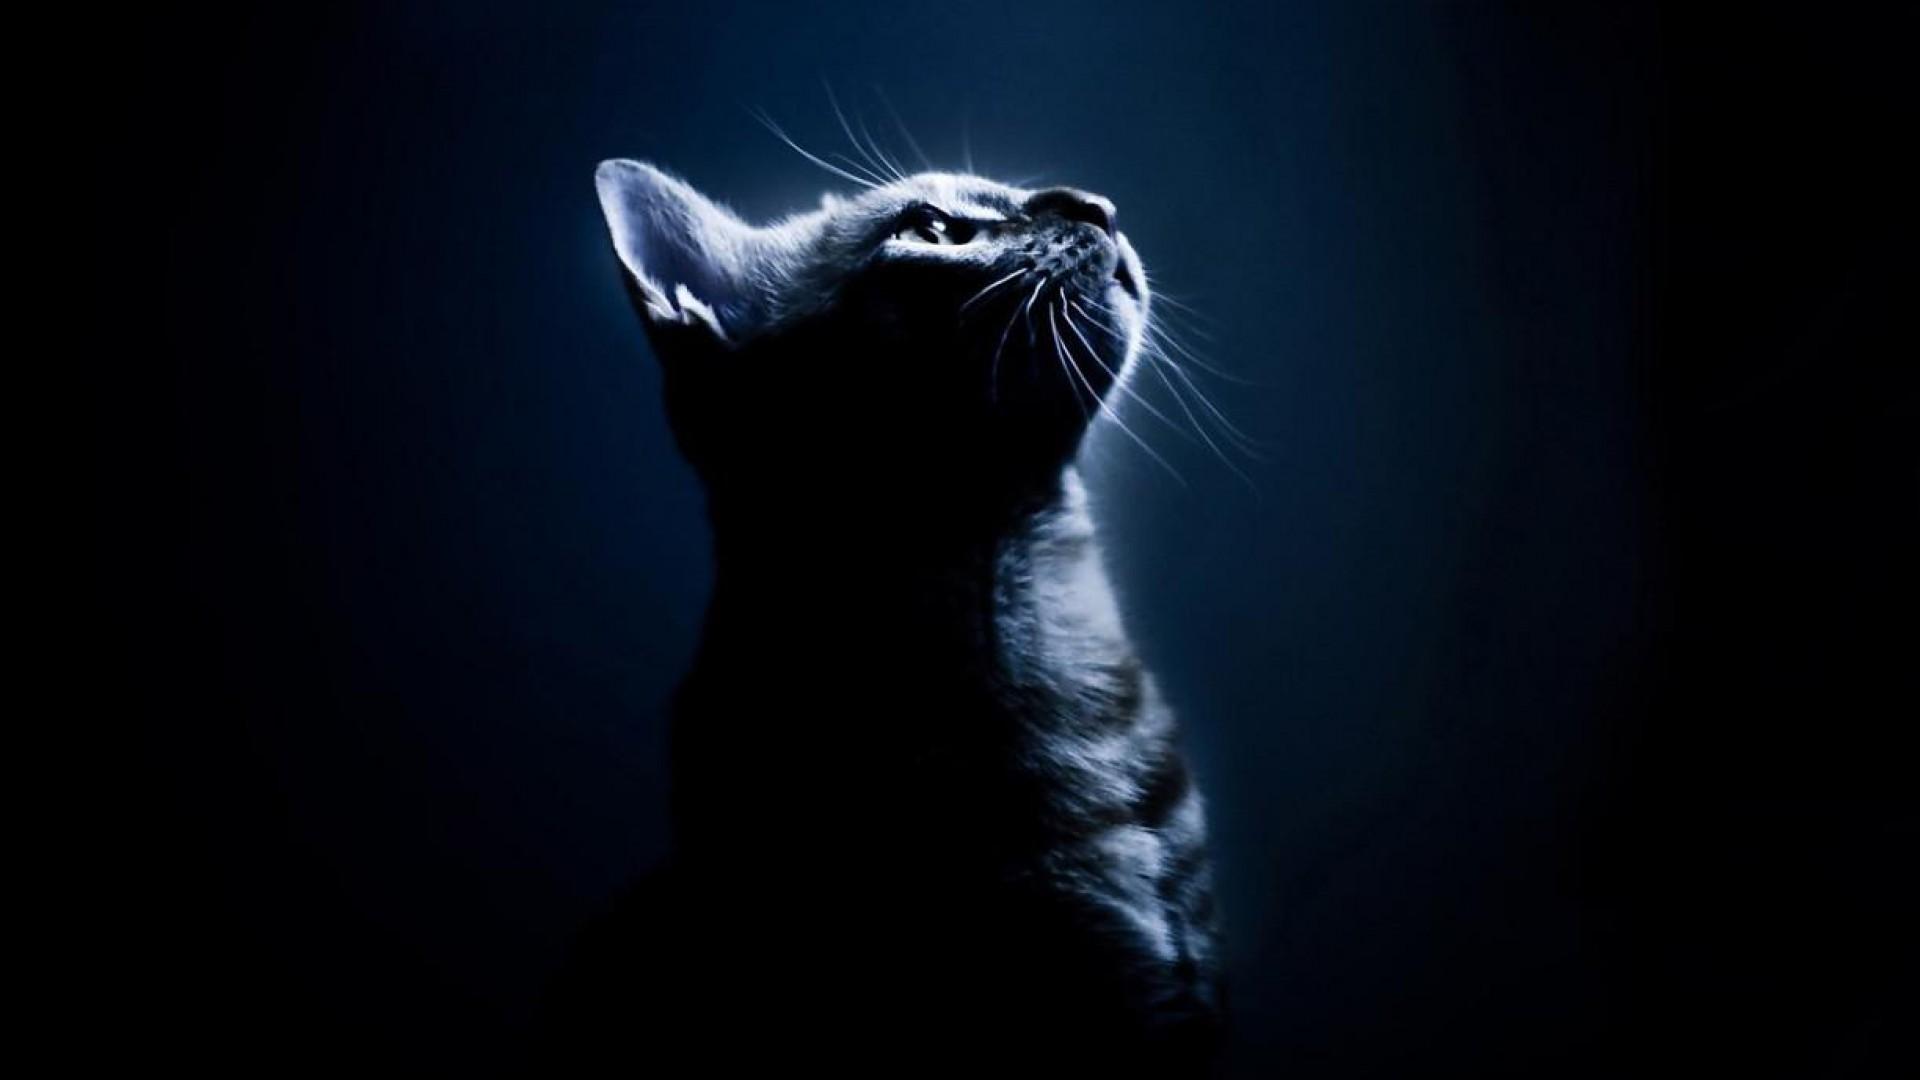 Black Cats Team Anonymous